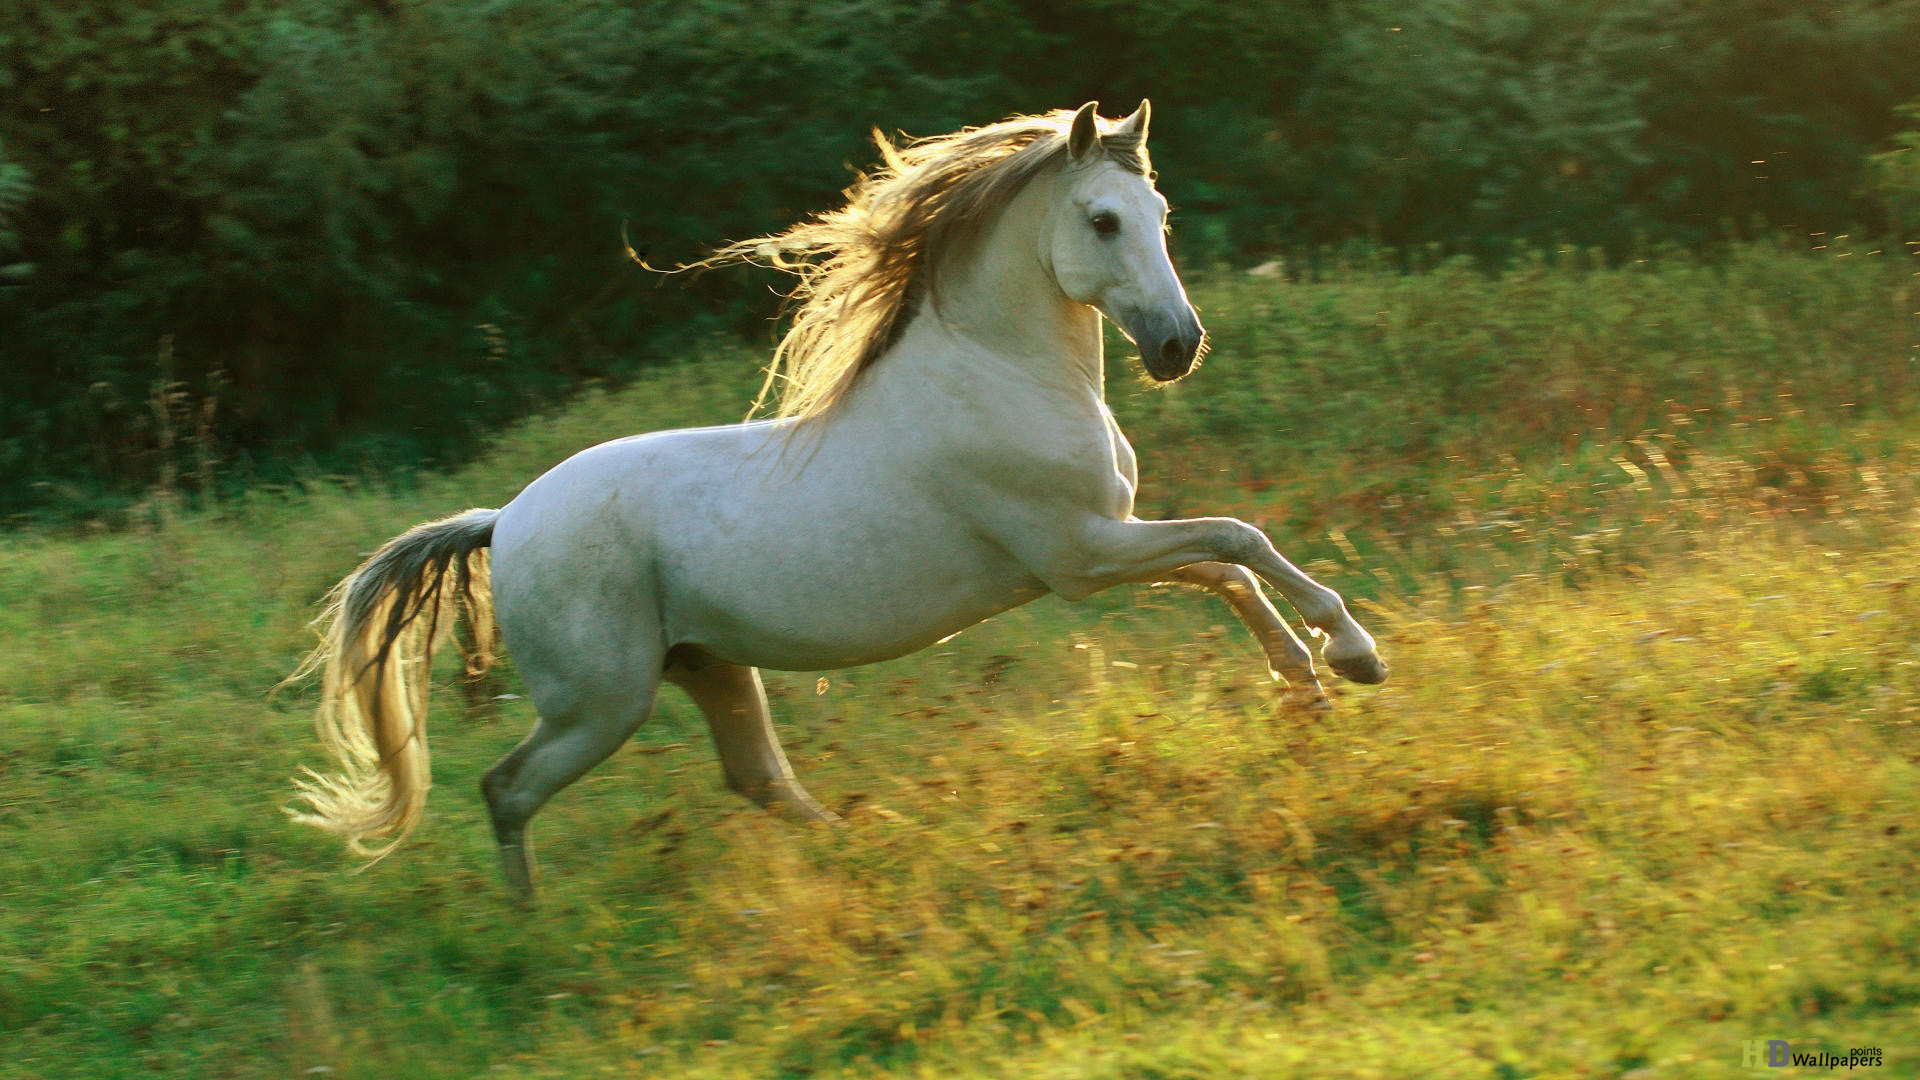 Horses Running Wallpapers for Desktop HD Wallpaper 1920x1080